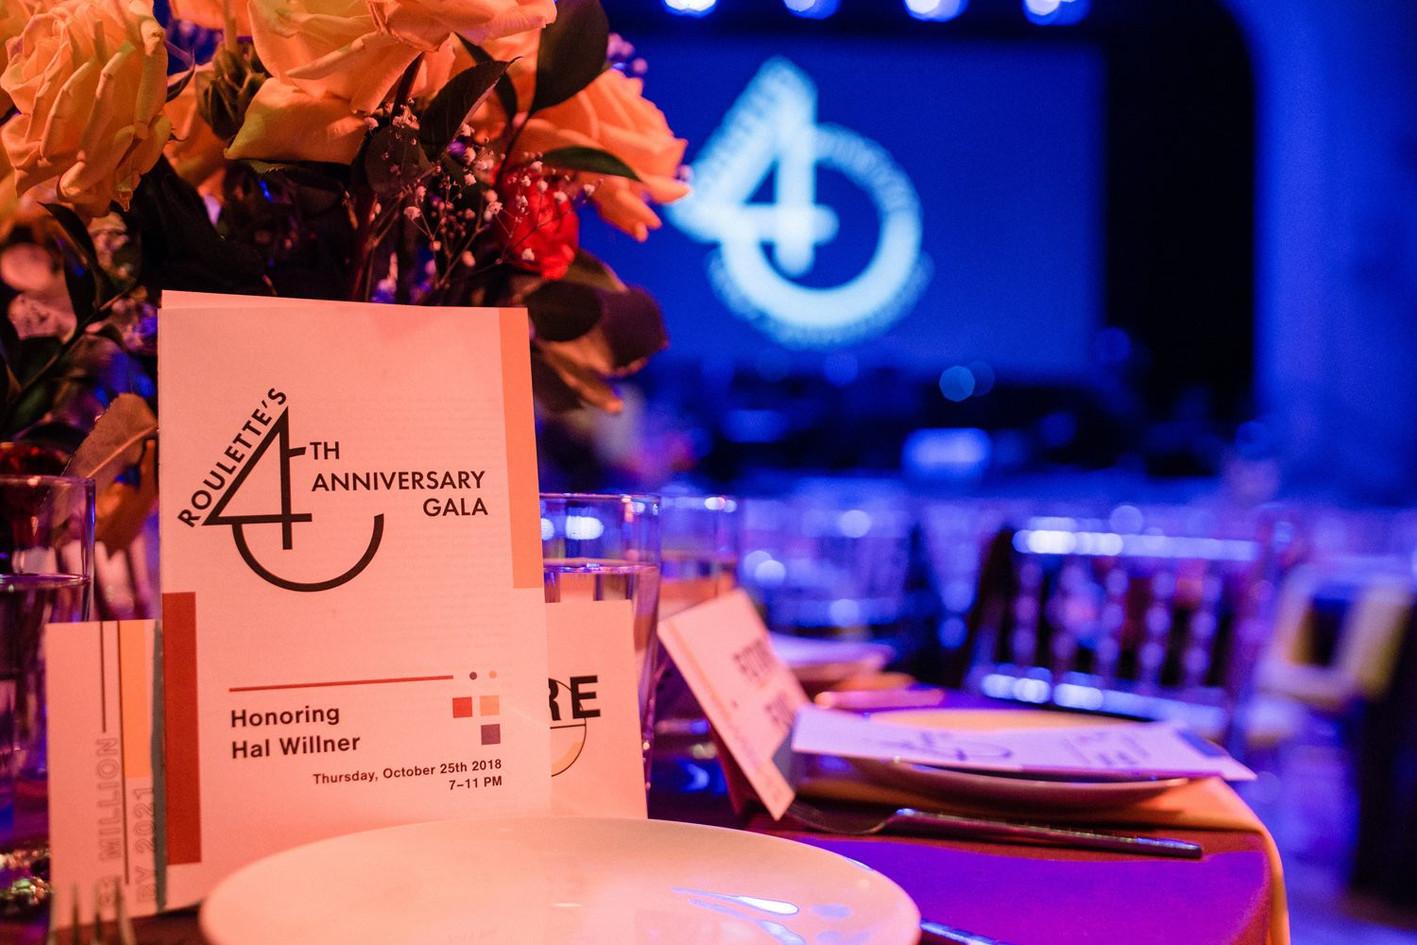 40th Anniversary Gala program